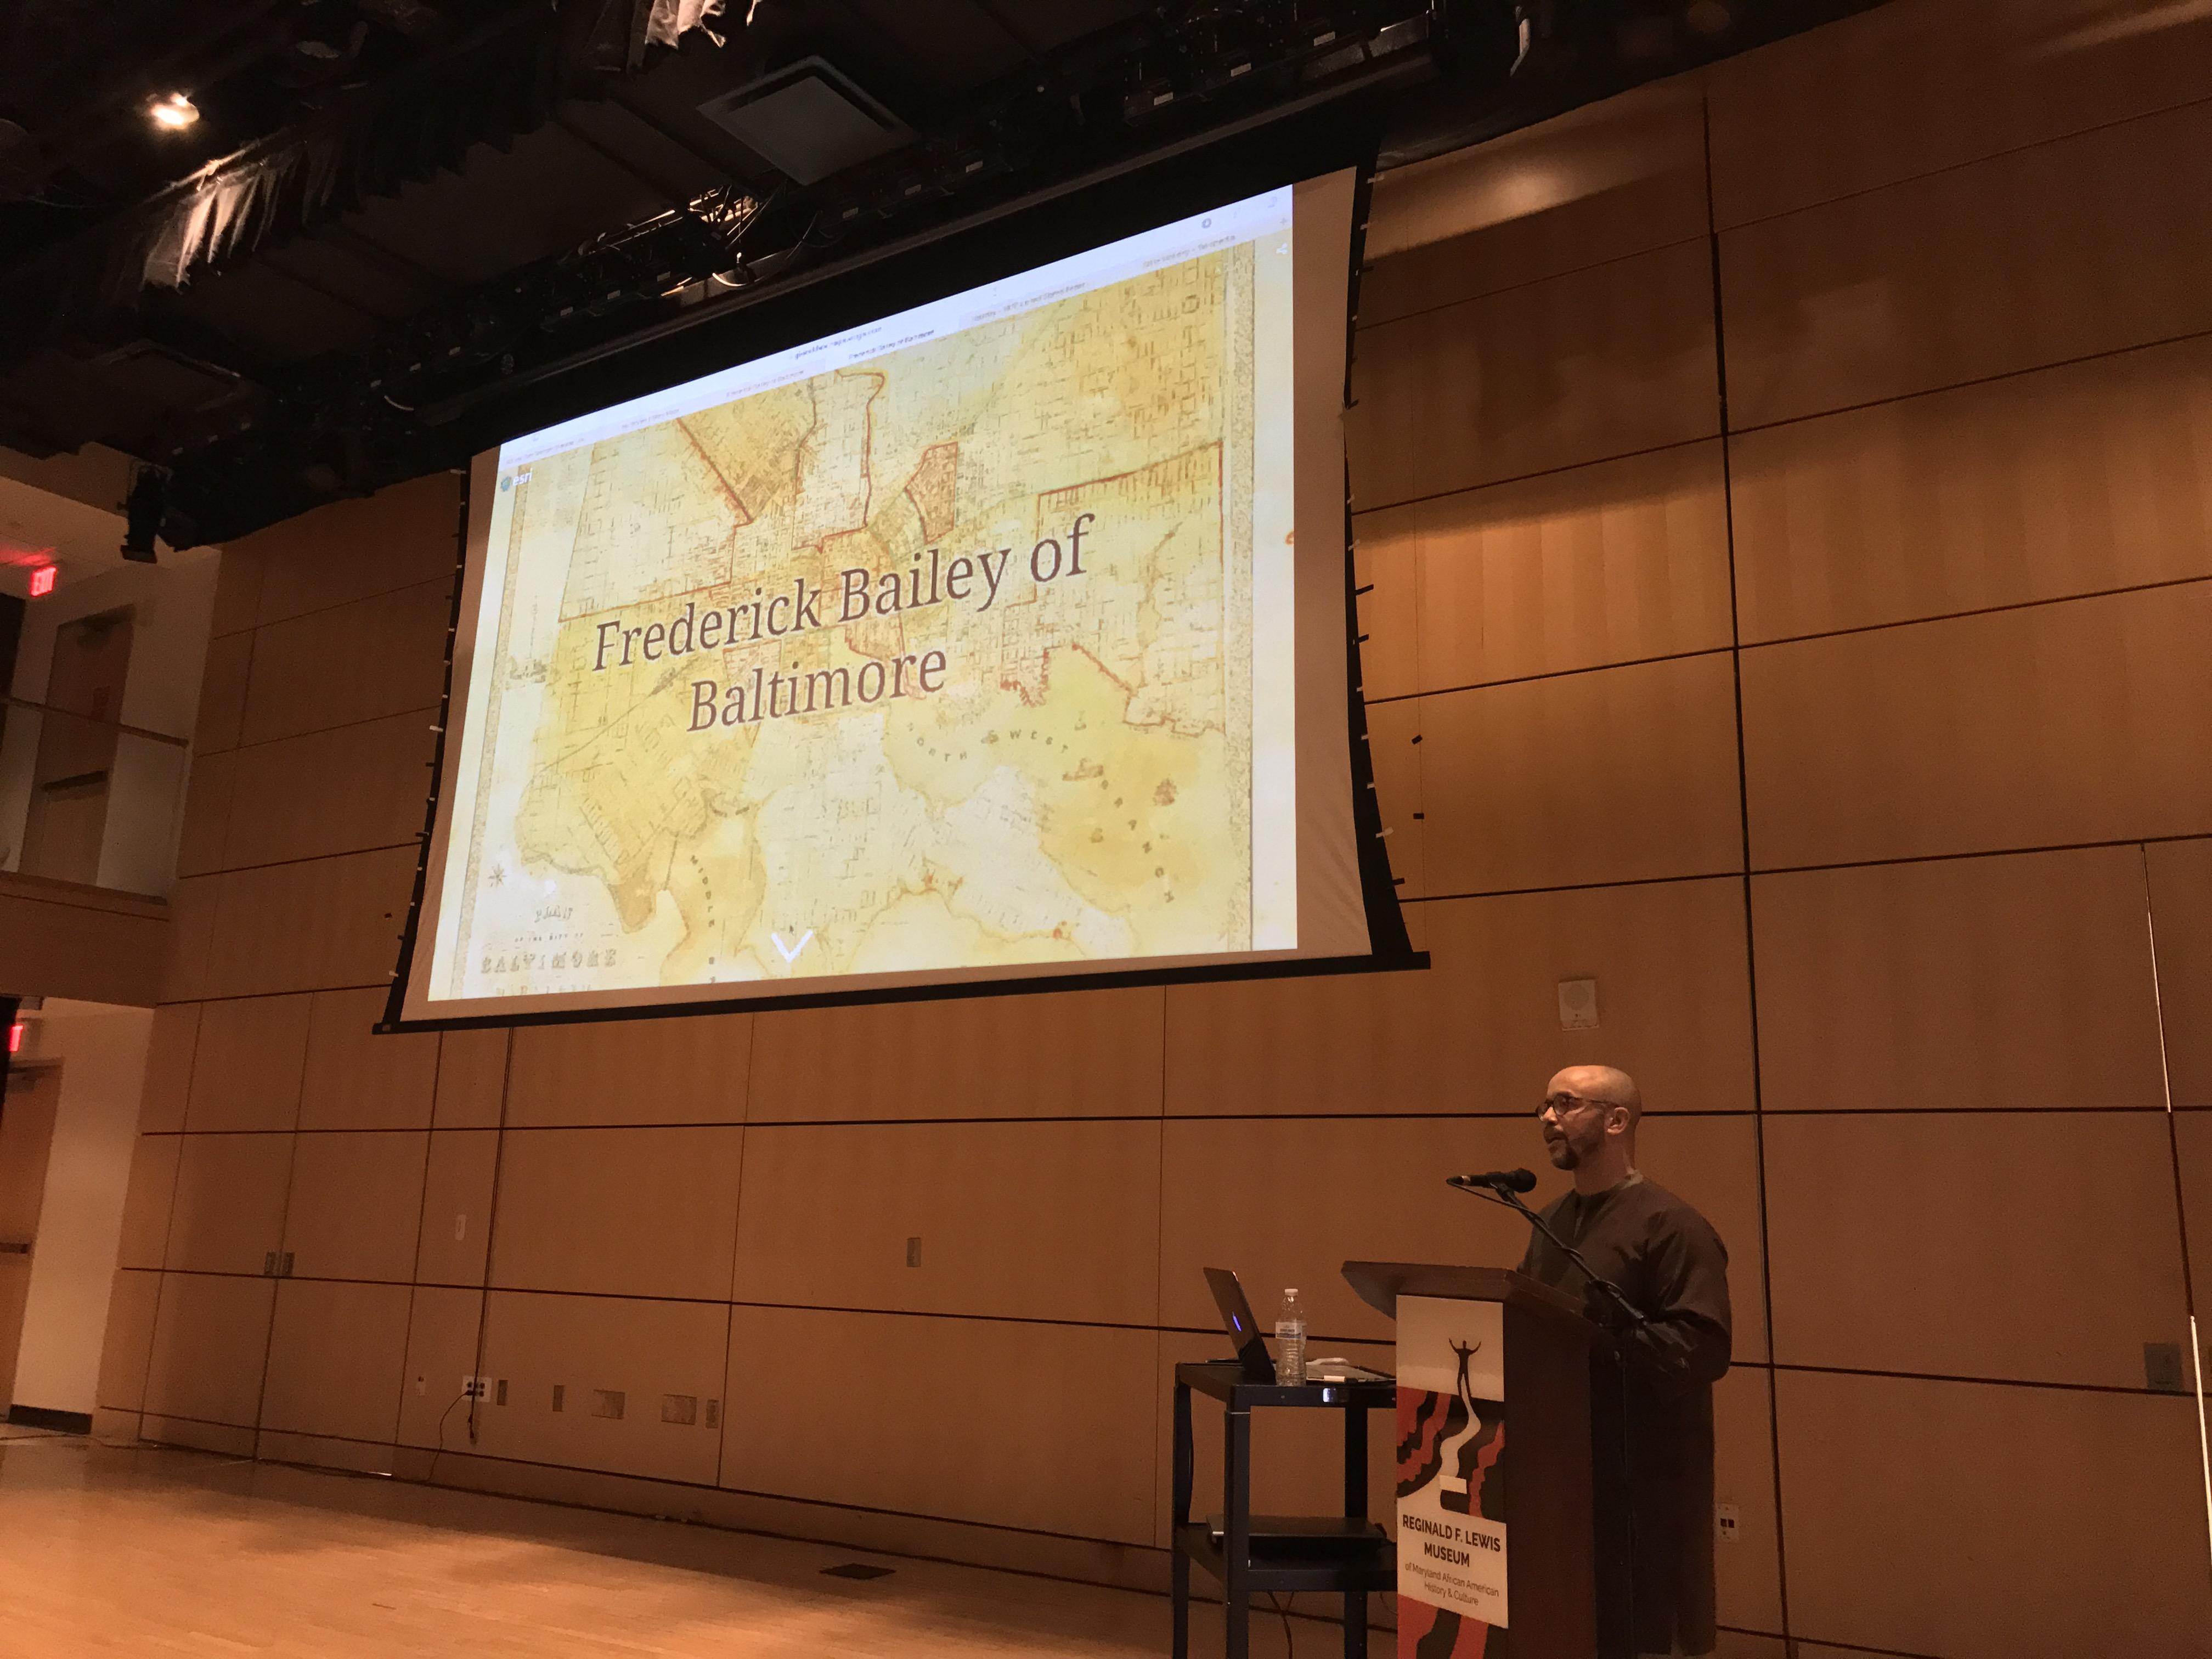 Frederick Bailey of Baltimore _ LJ_JHU_2.10.2018